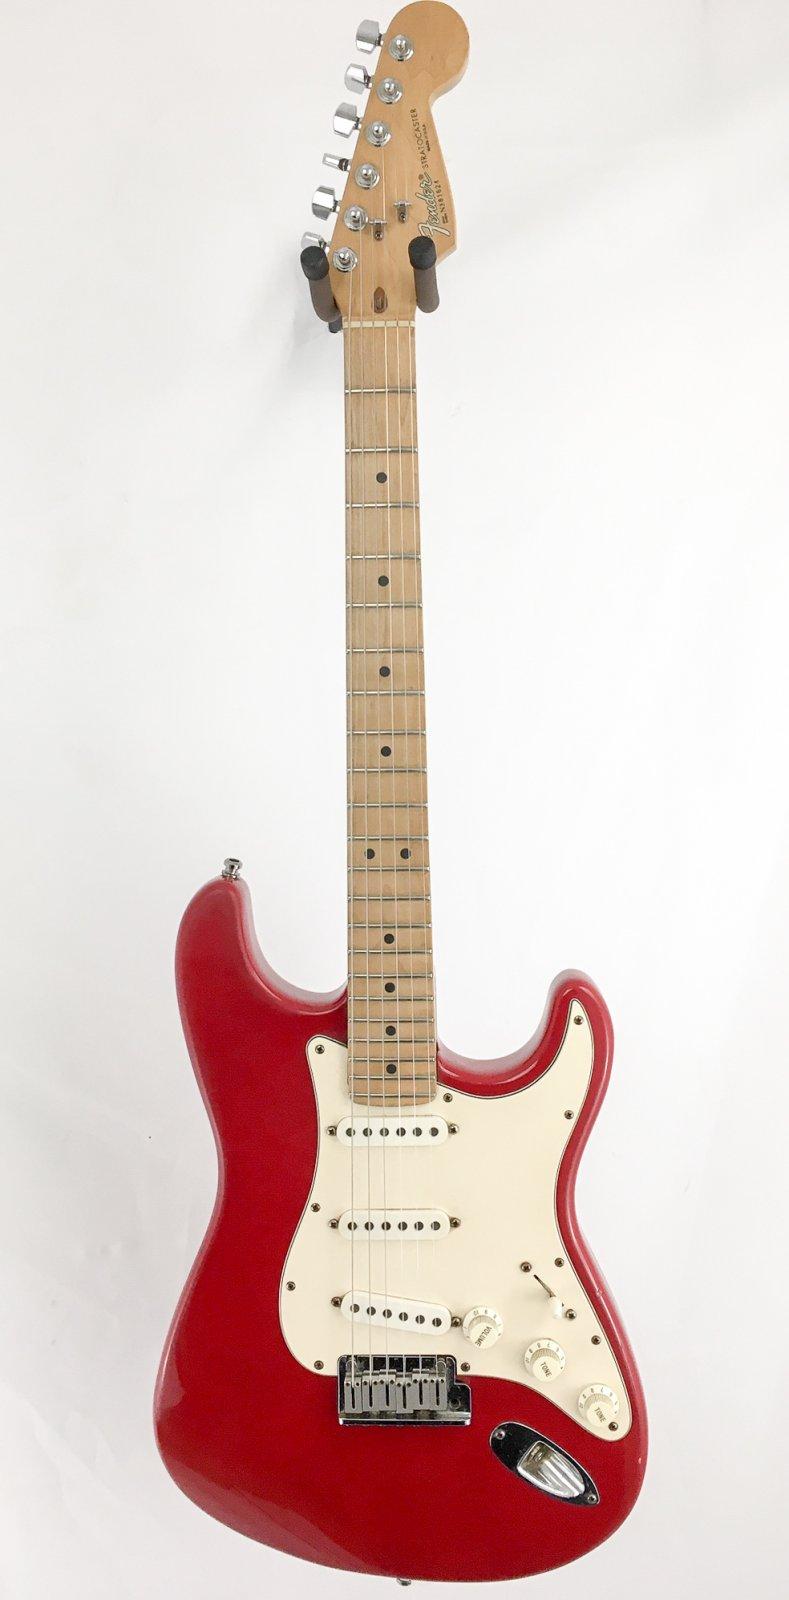 1993 Fender American Standard Strat